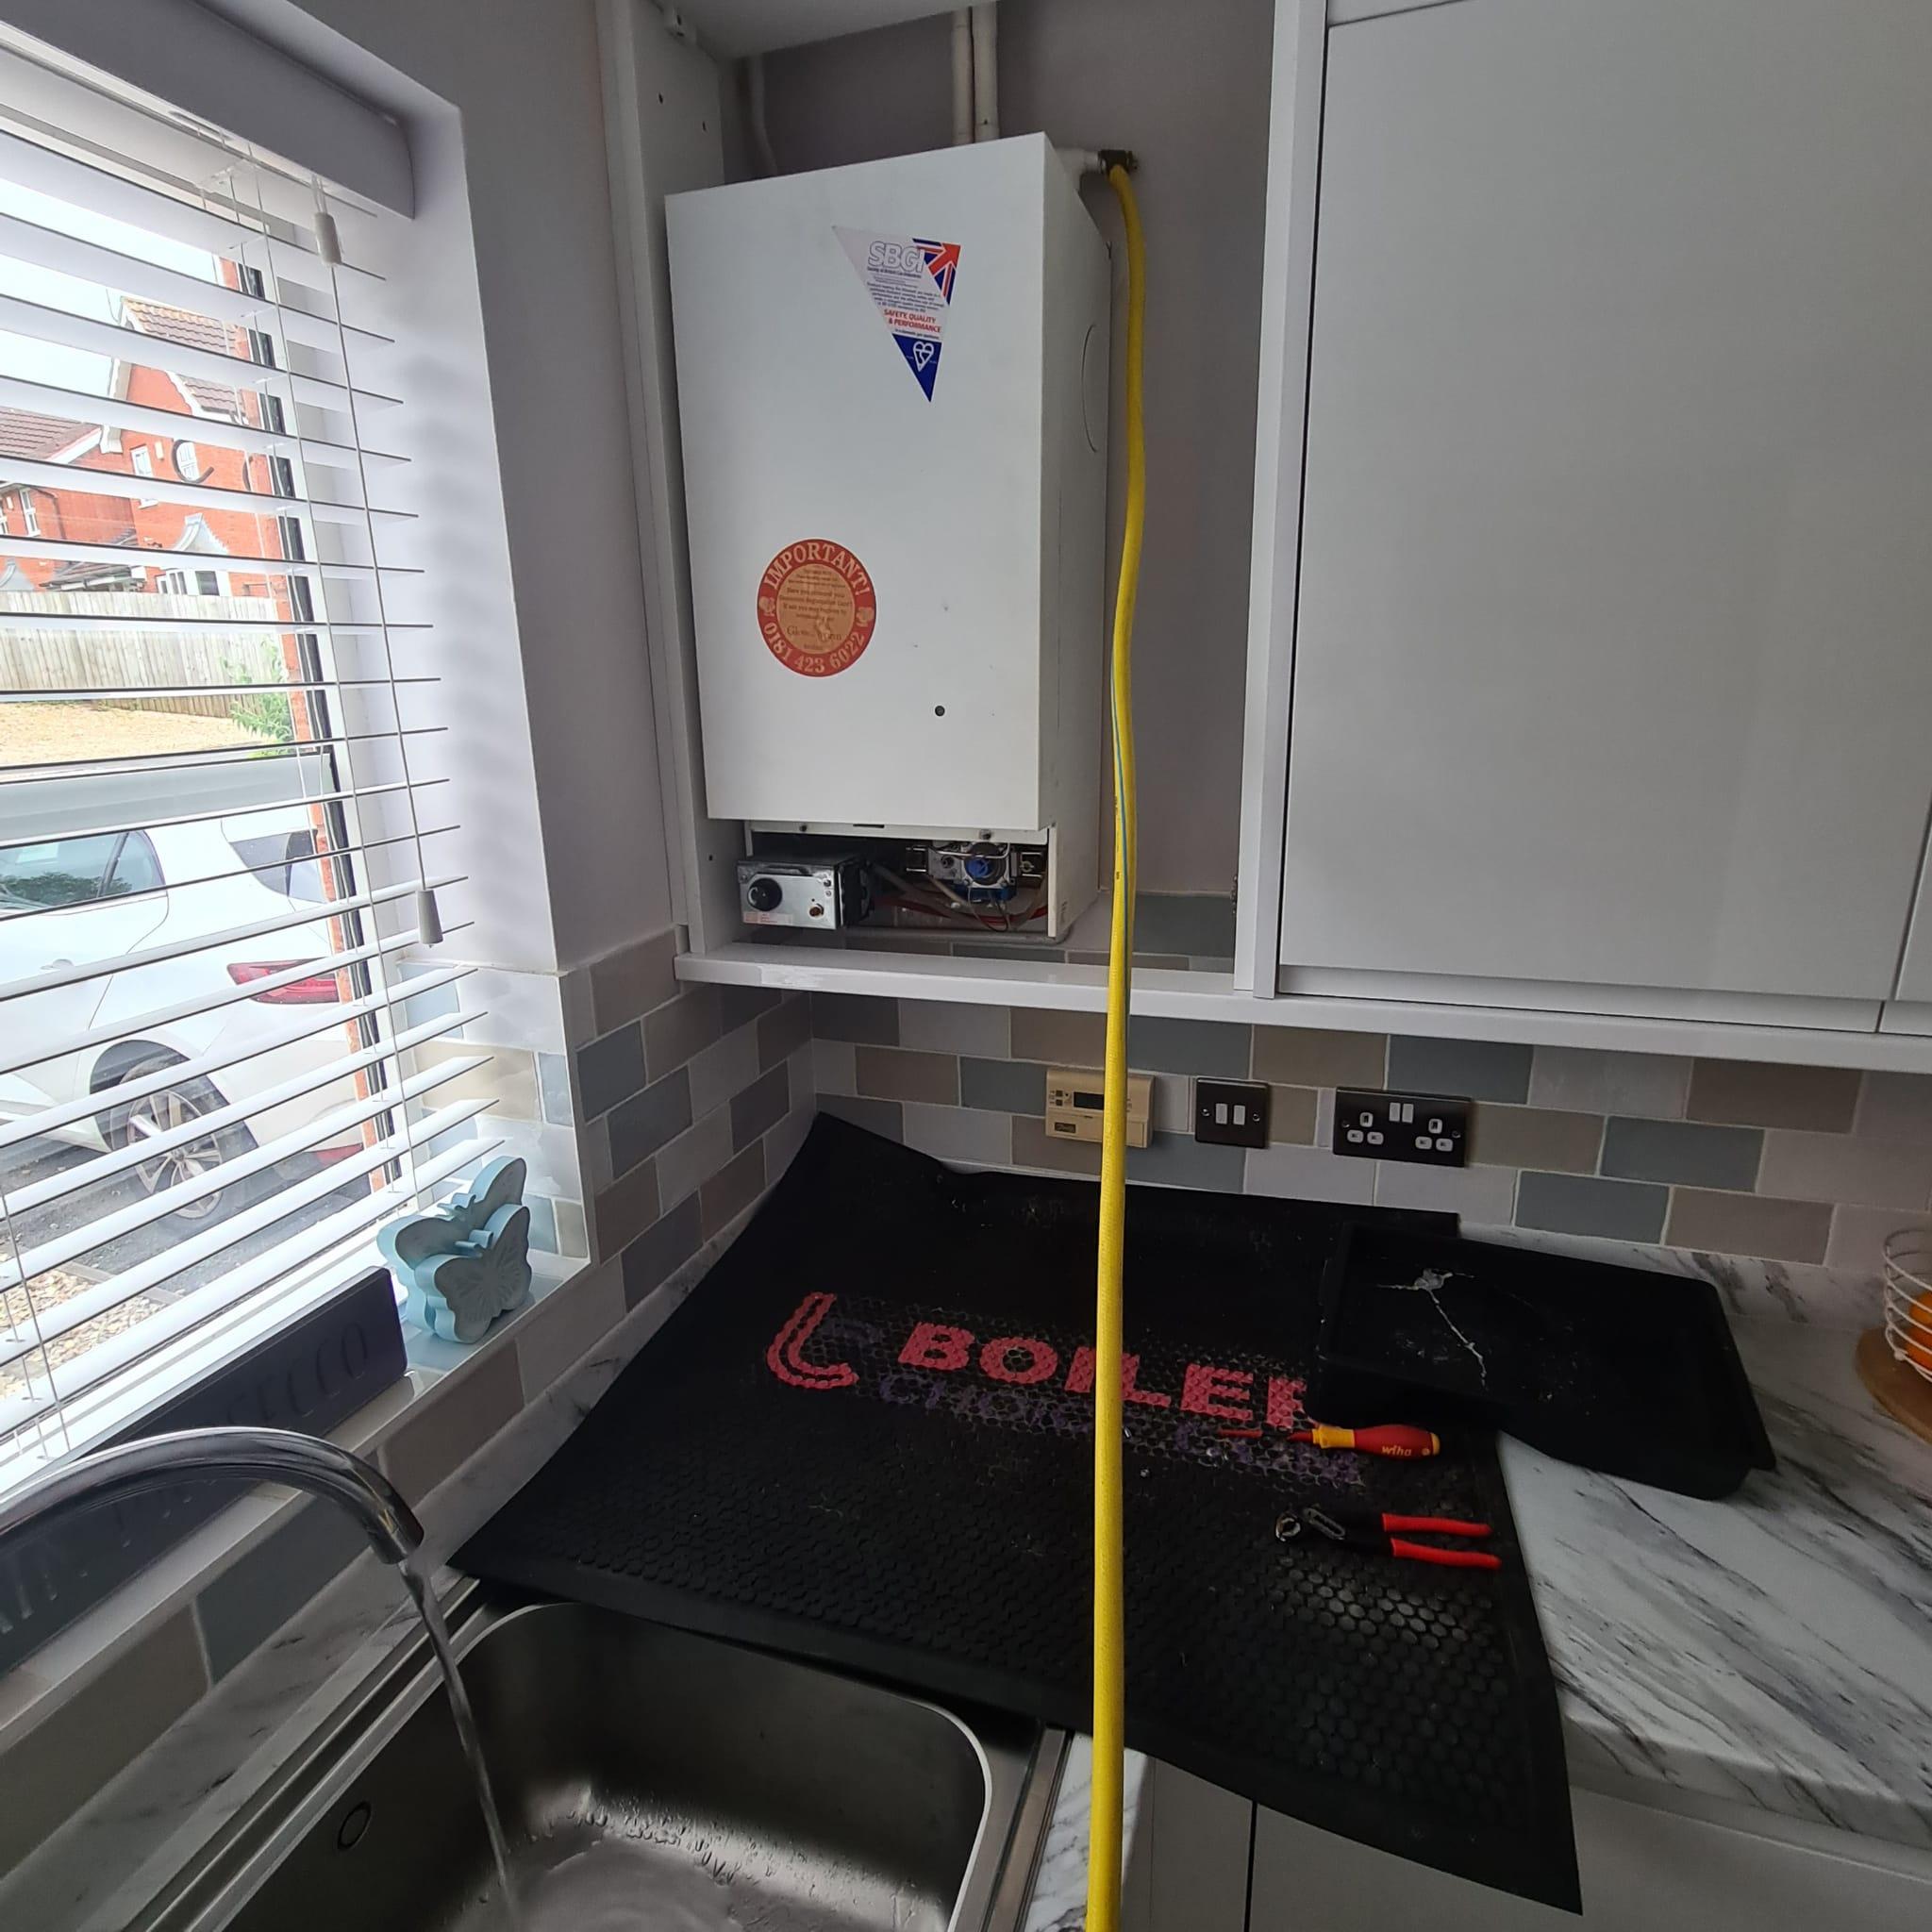 Boiler replacement birmignham